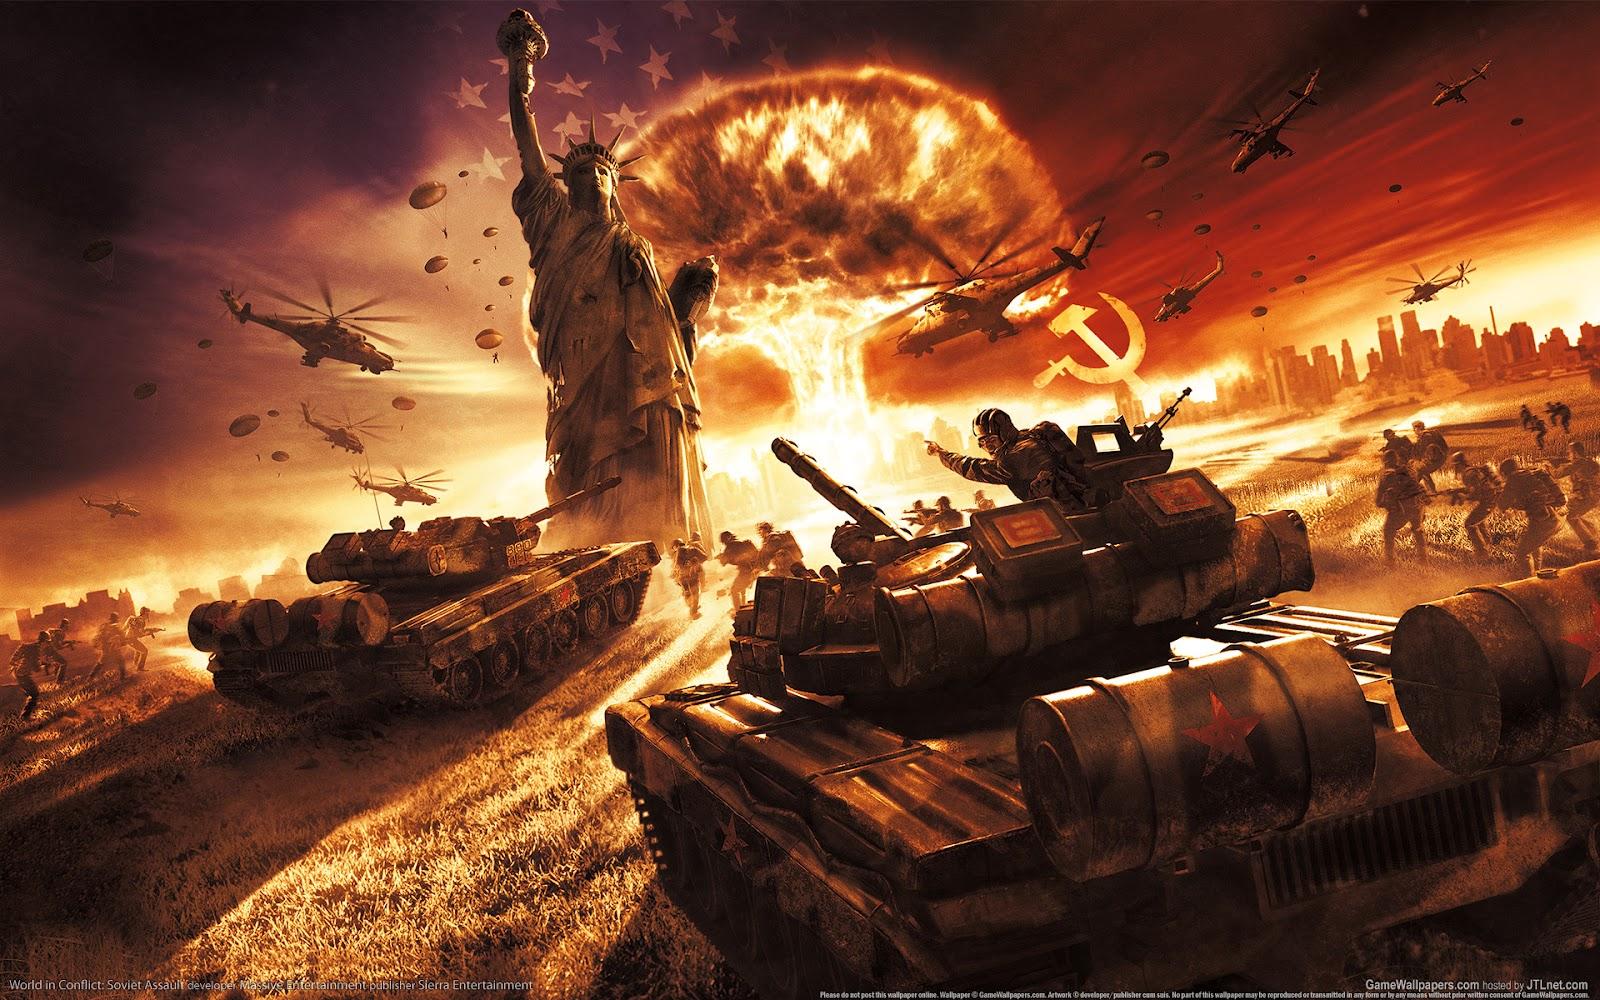 http://1.bp.blogspot.com/-O0WD918jHJI/UGxAt0pEQzI/AAAAAAAACIY/UUHaD3Lz28I/s1600/4a094edb_3a6c207d_wallpaper_world_in_conflict_soviet_assault_03_1920x1200.jpg